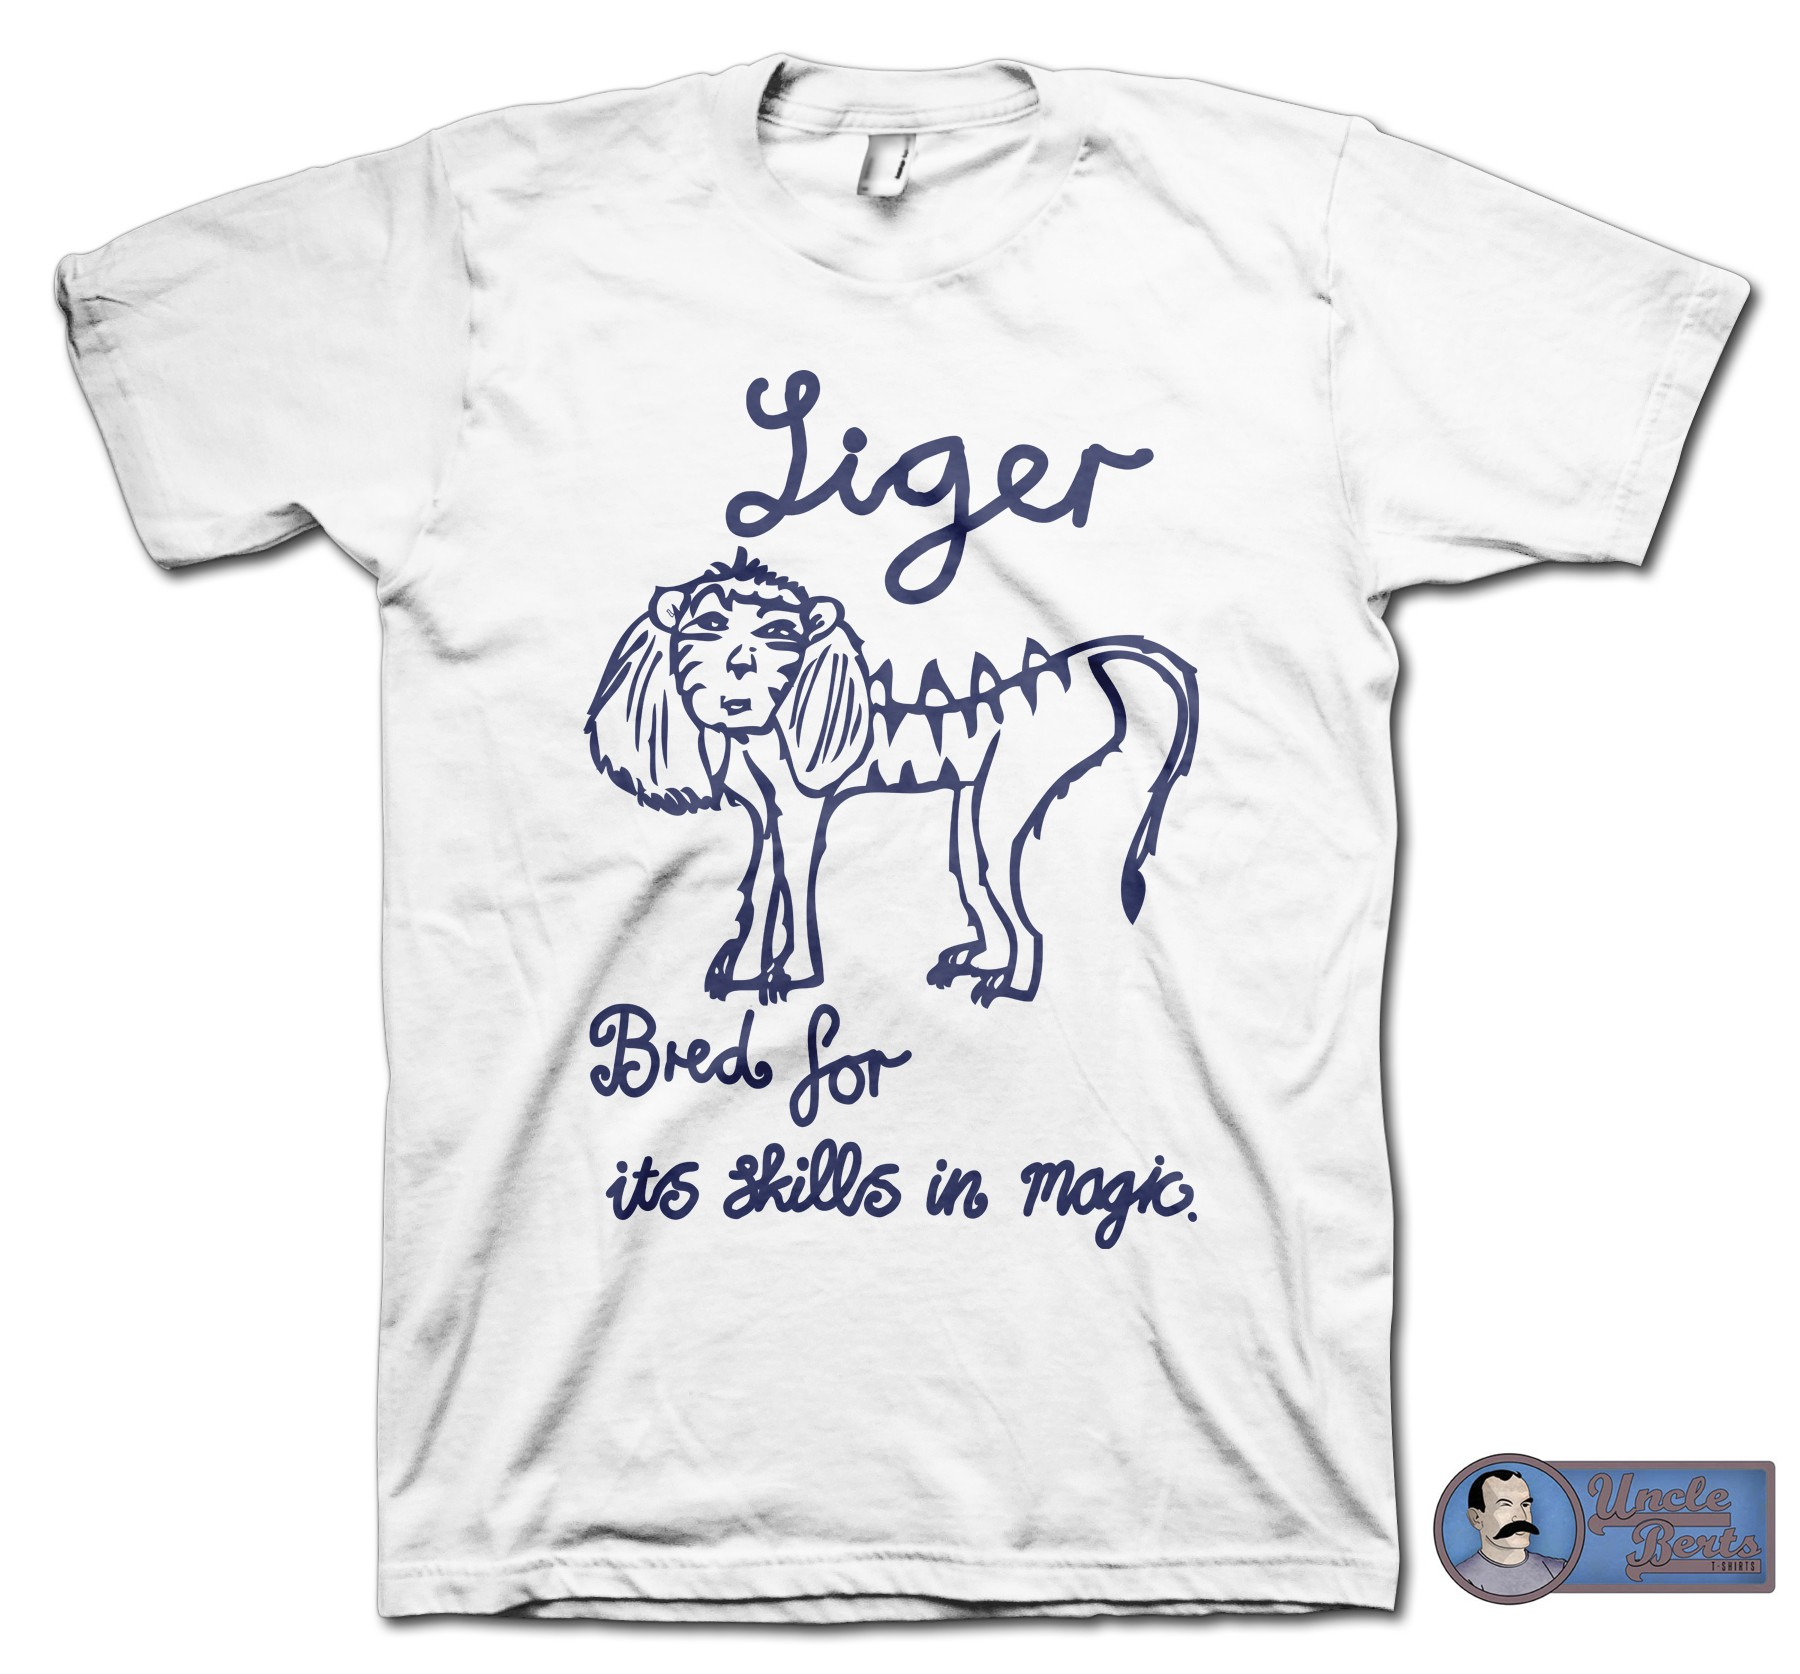 Napoleon Dynamite (2004) inspired Liger T-Shirt